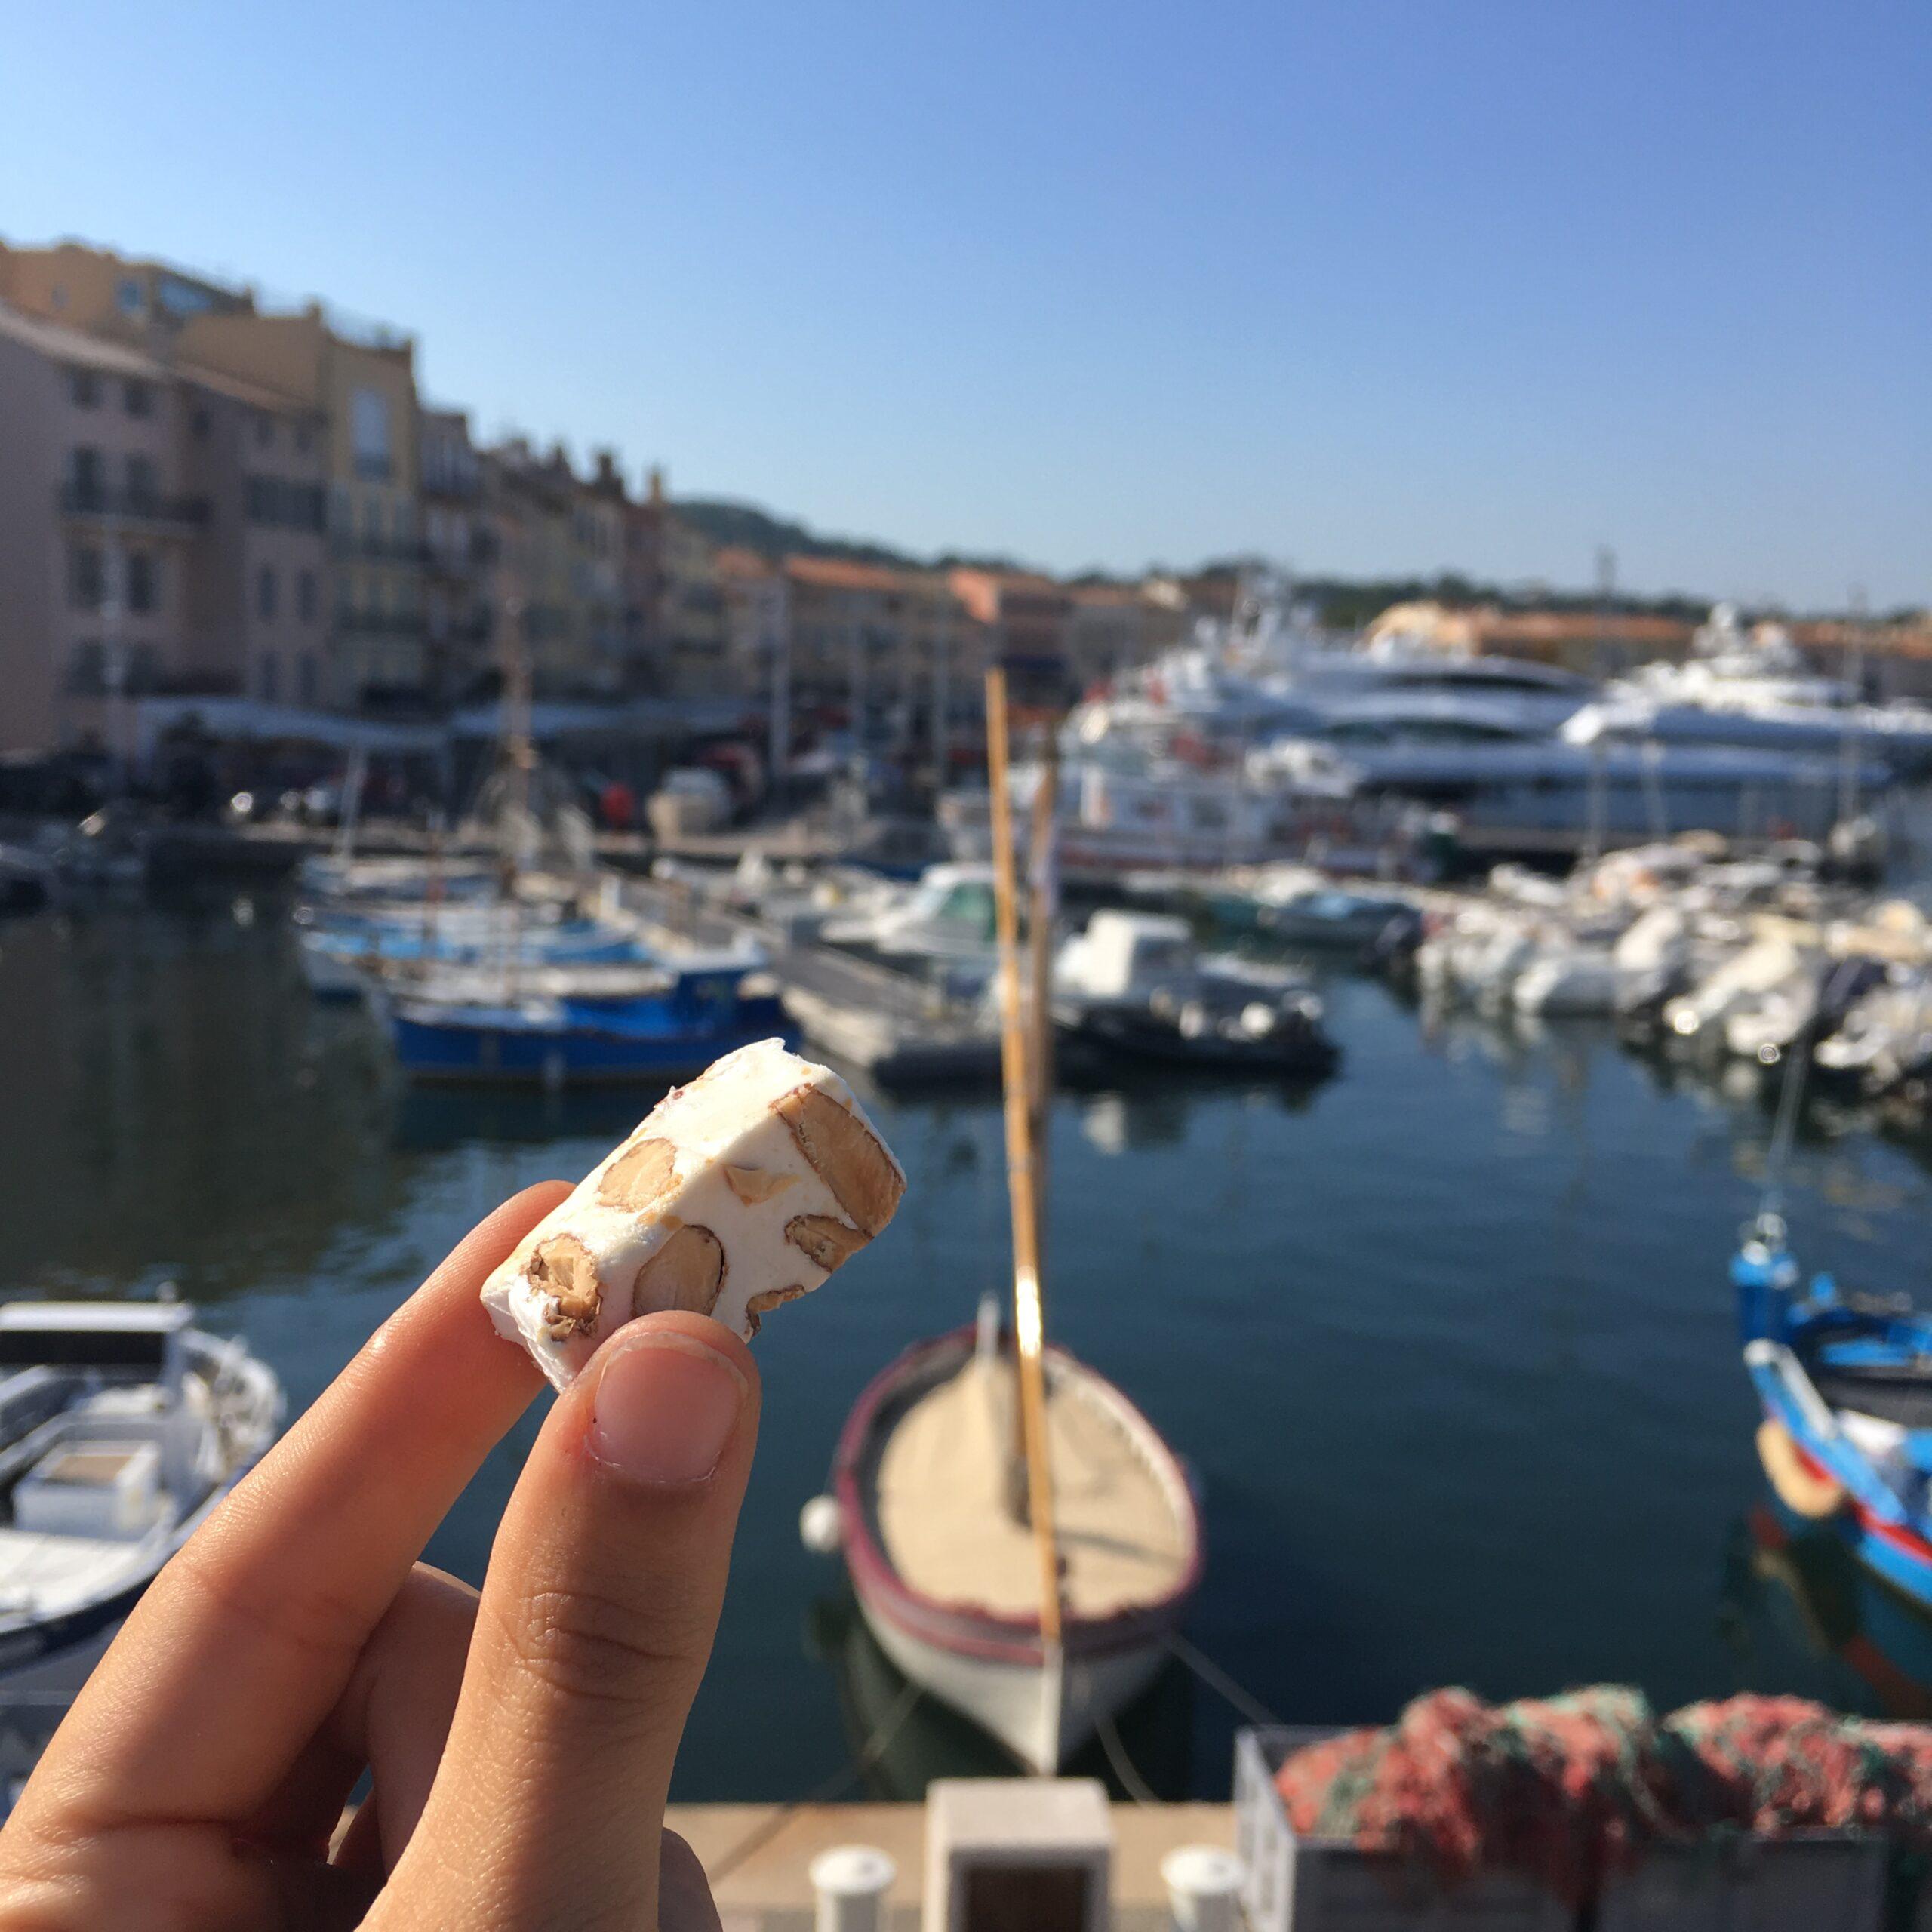 Nougat blanc tendre de Provence en domino. Achat nougat en ligne - prix du nougat